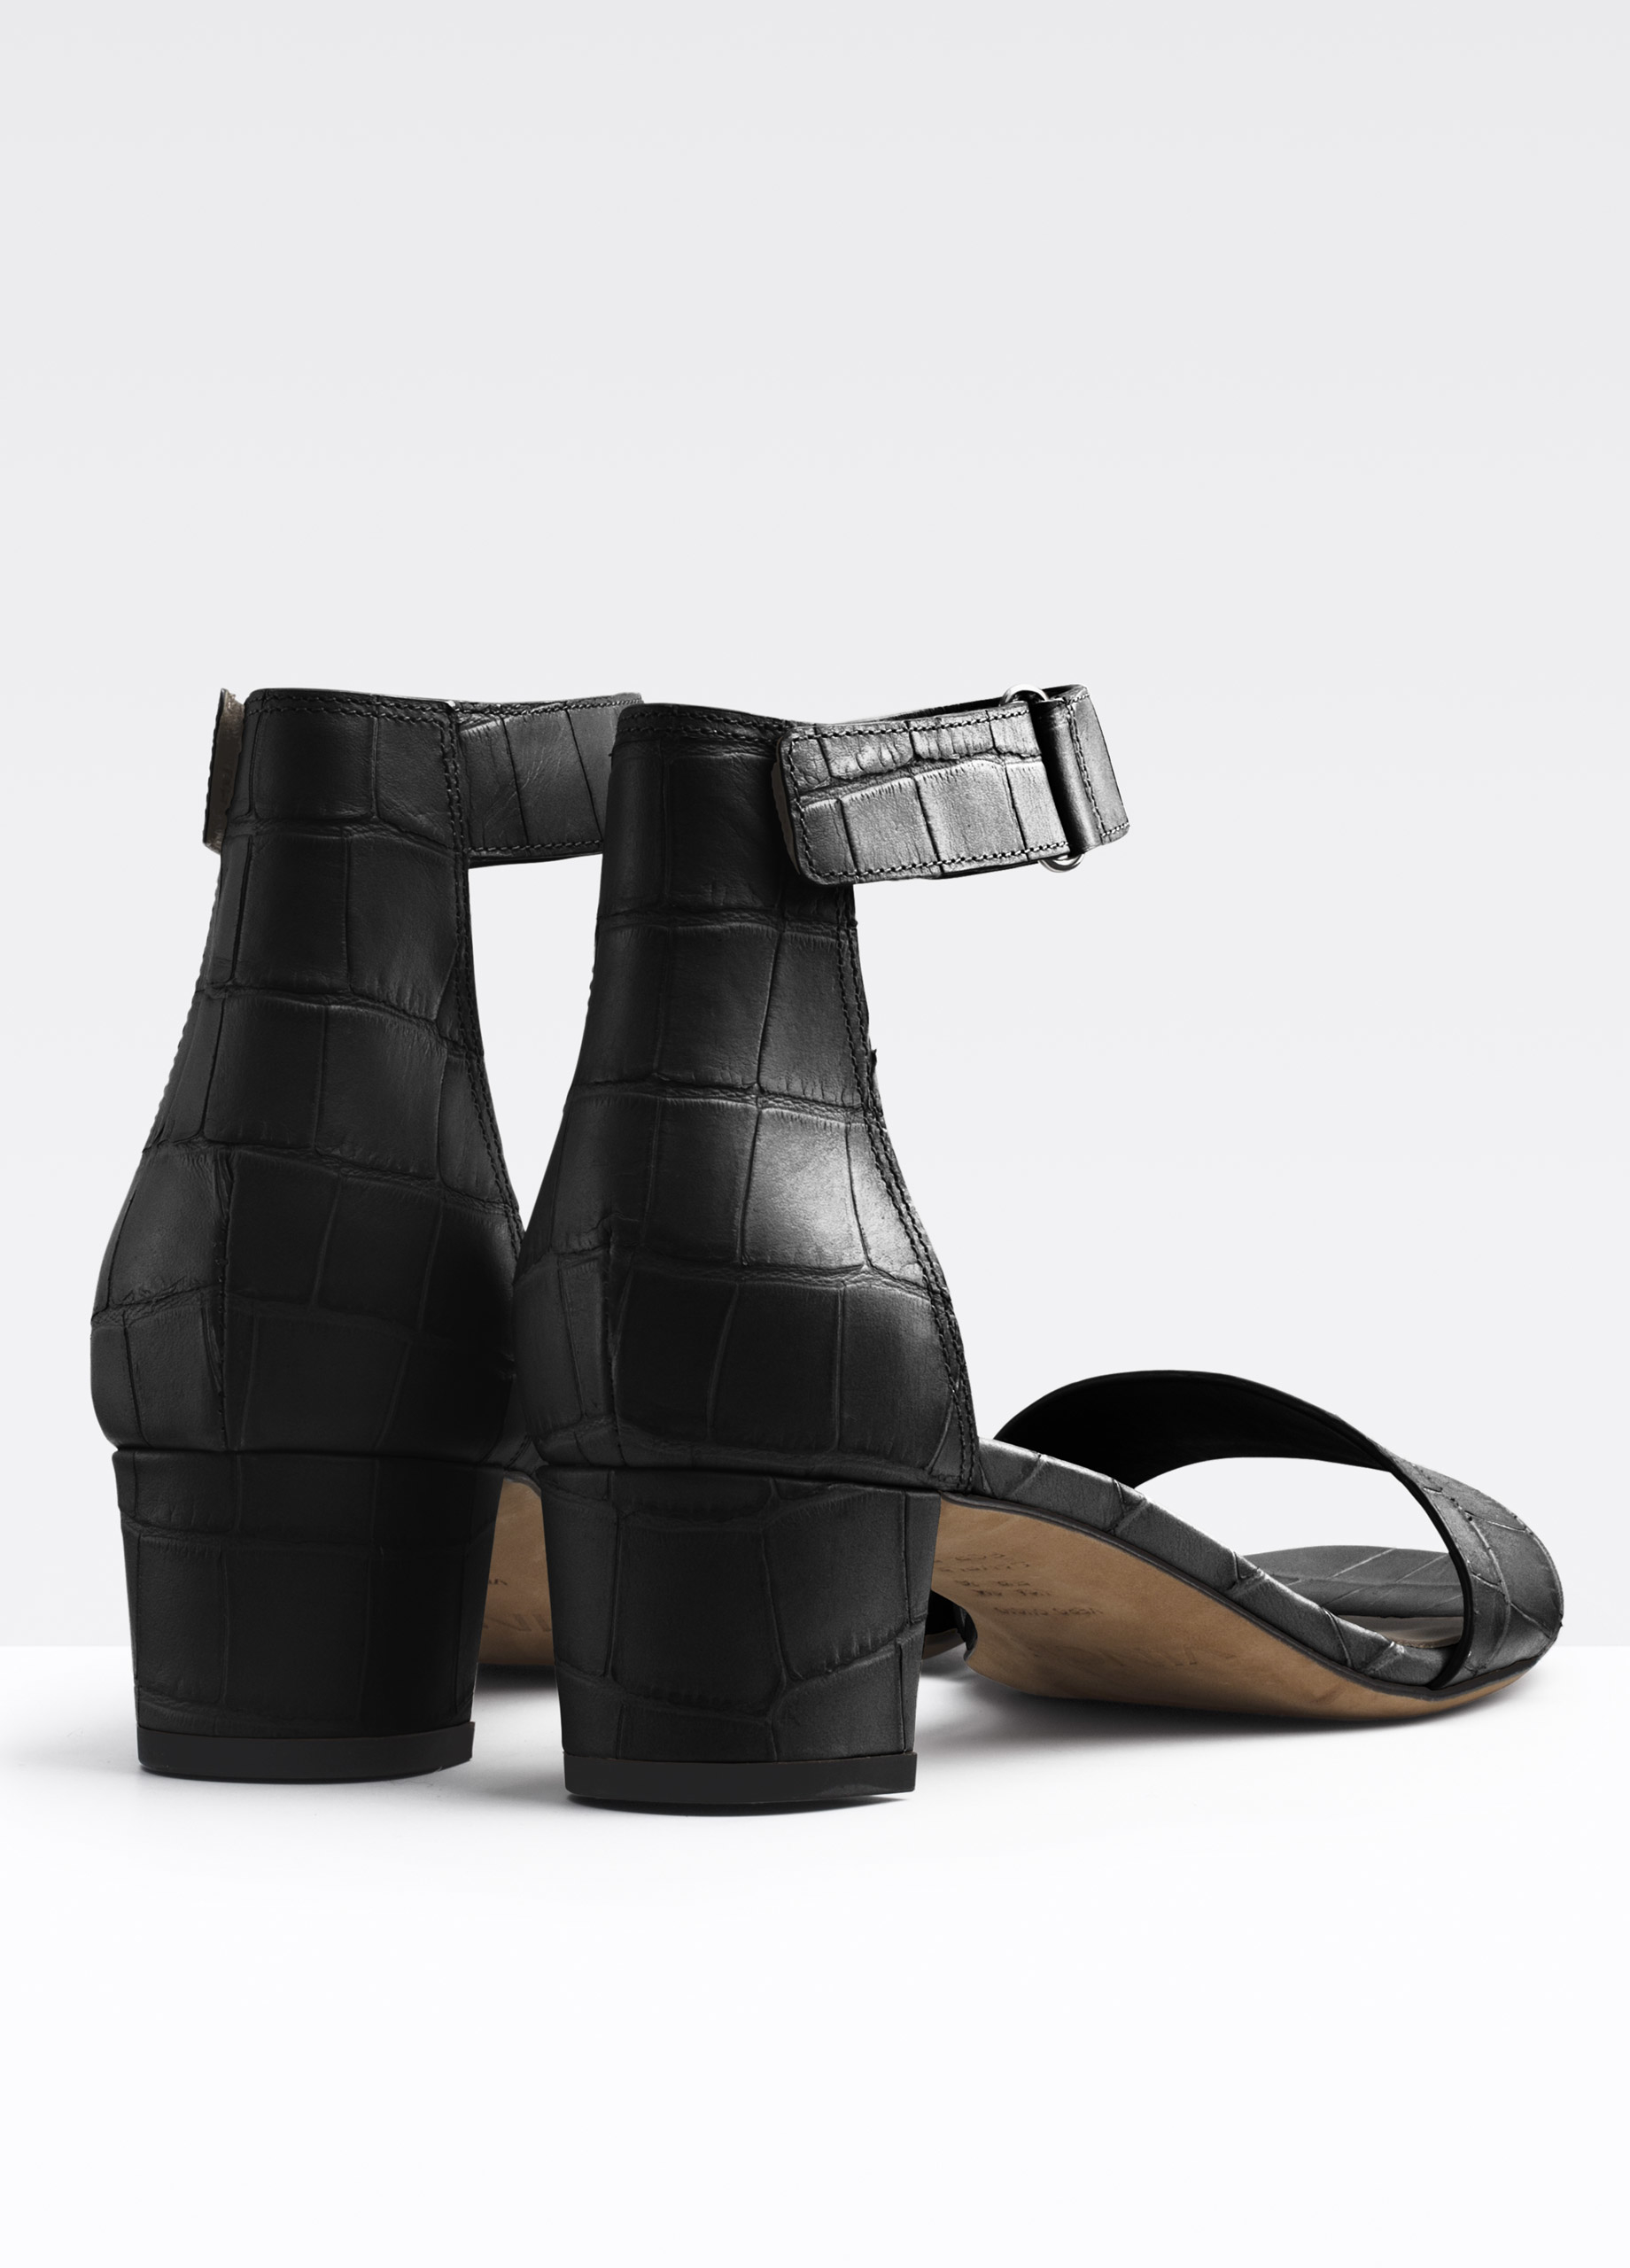 Vince Rita Croc Printed Leather City Sandal In Black Lyst